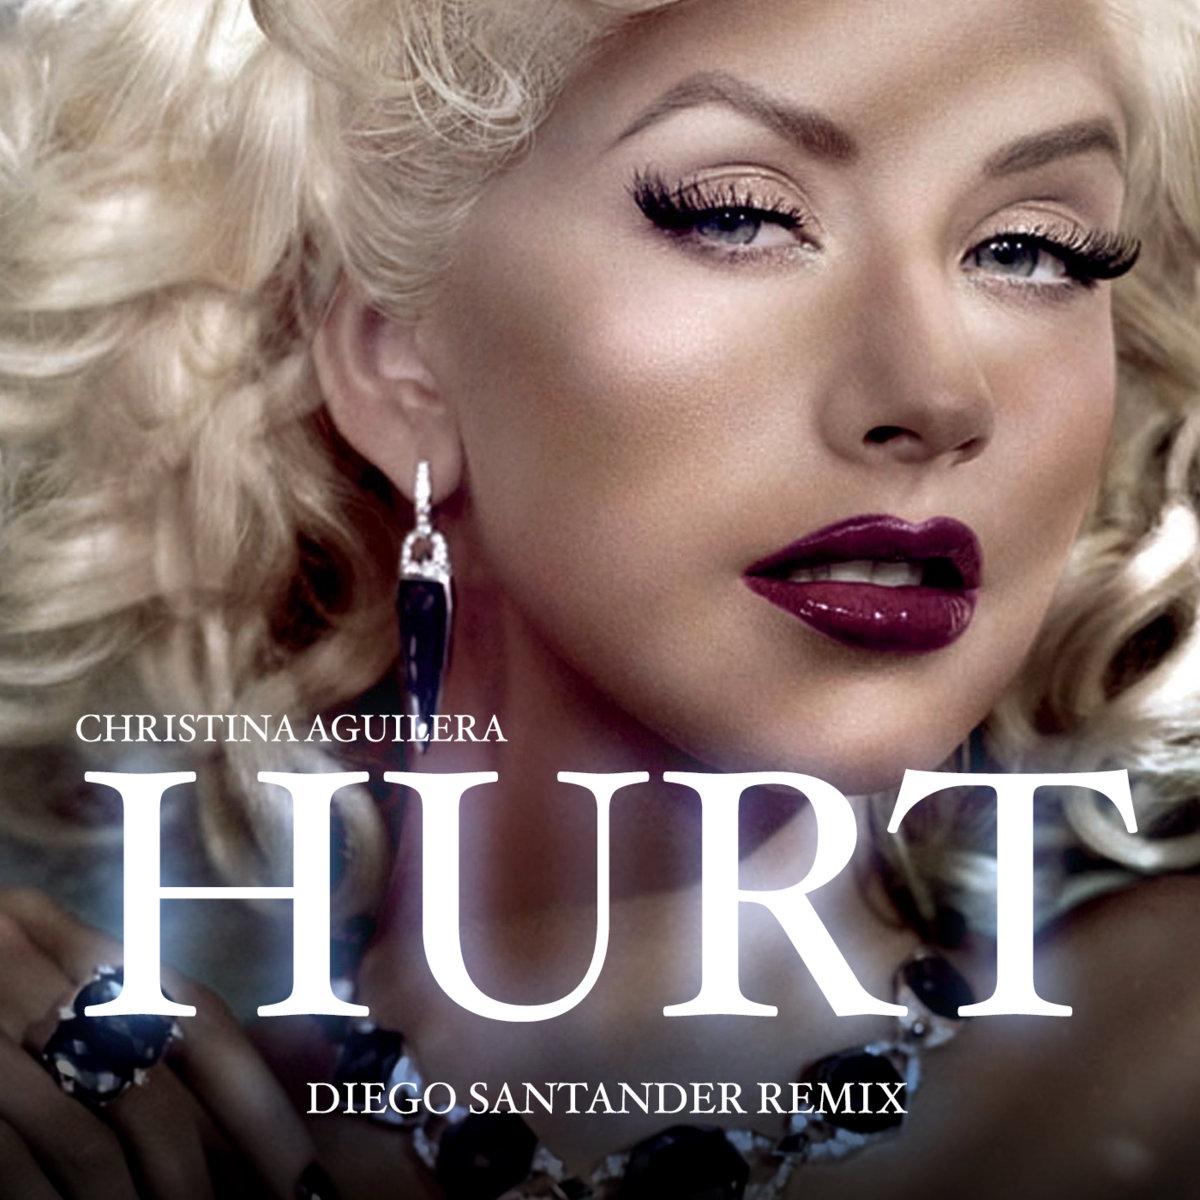 hurt christina aguilera mp3 free download